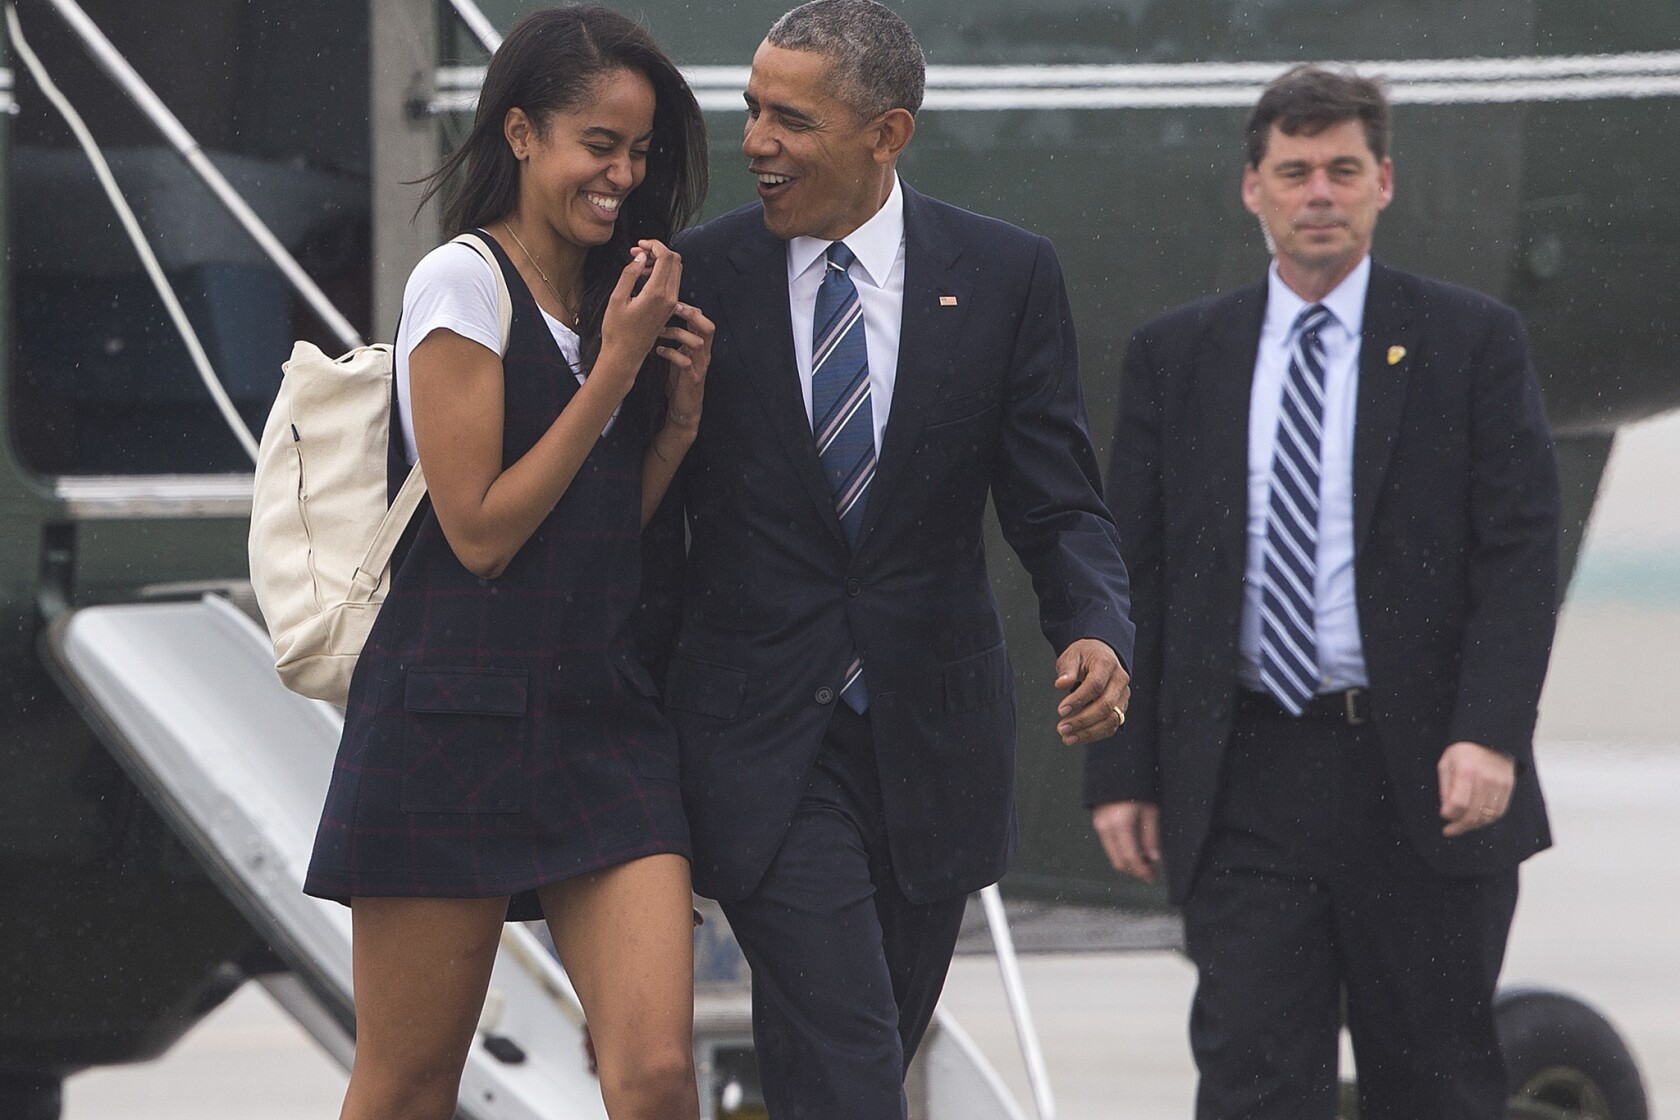 Obama dines with Disney executives, Julia Roberts at glitzy